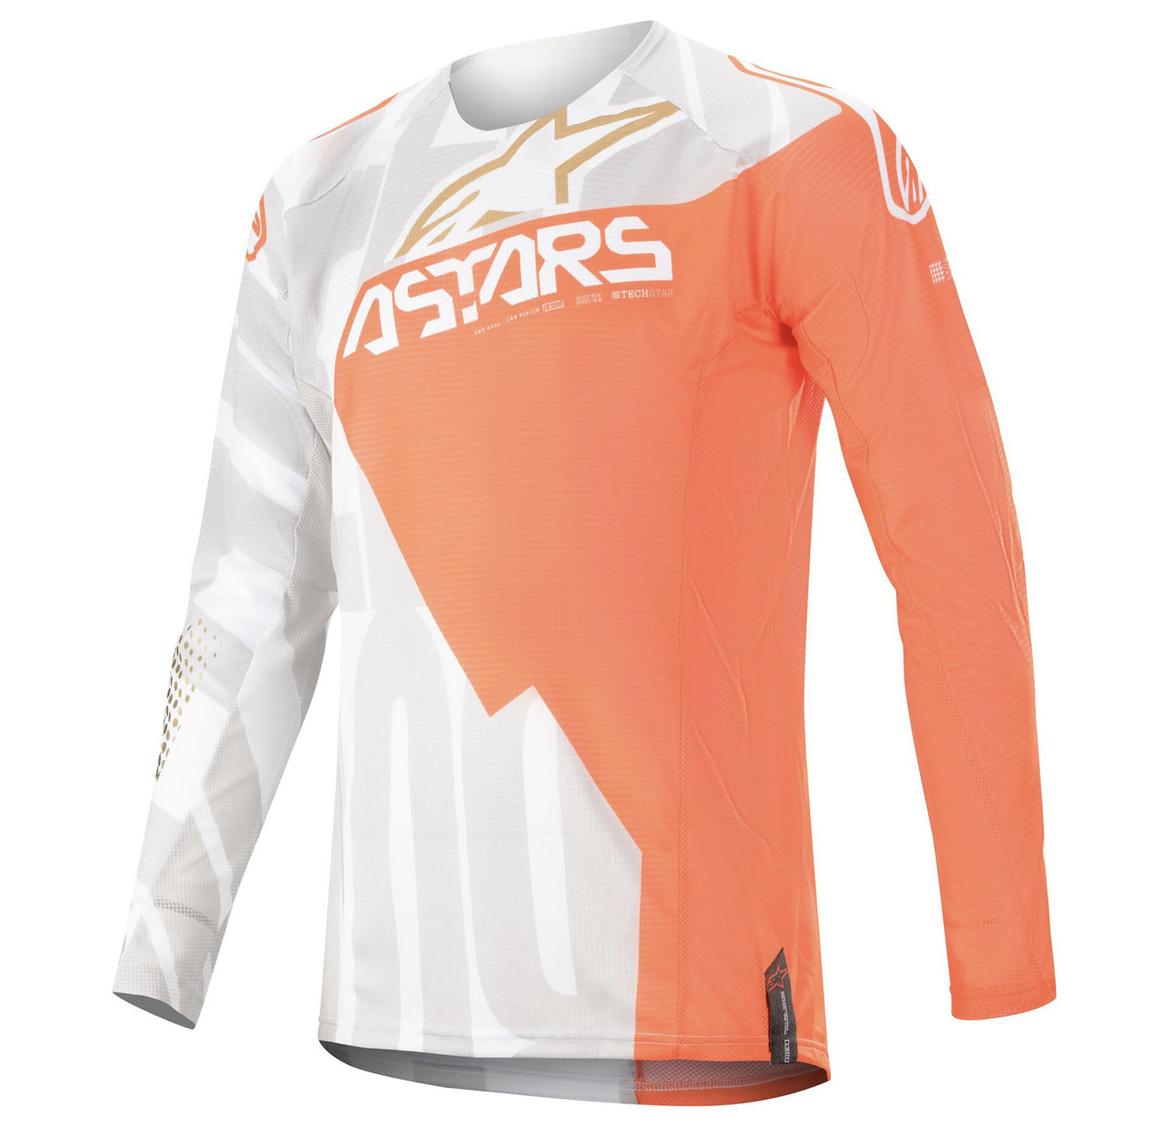 Jersey Alpinestars Techstar 2020 Factory Metal Blanca / Naranja Fluo / Dorada.